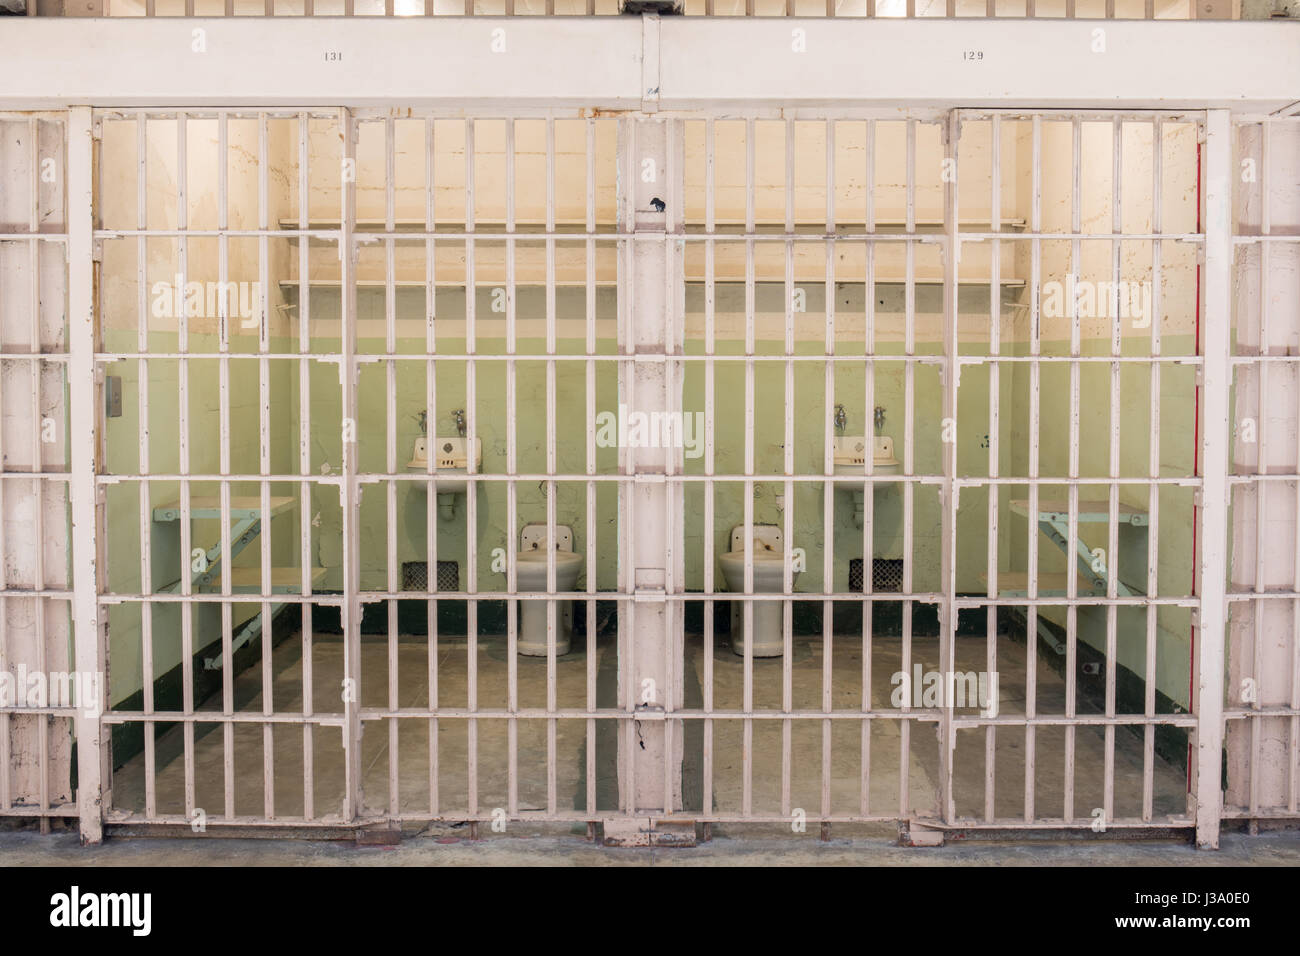 San Francisco, California, United States - April 30, 2017: Adjacent cells of Alcatraz prison. - Stock Image